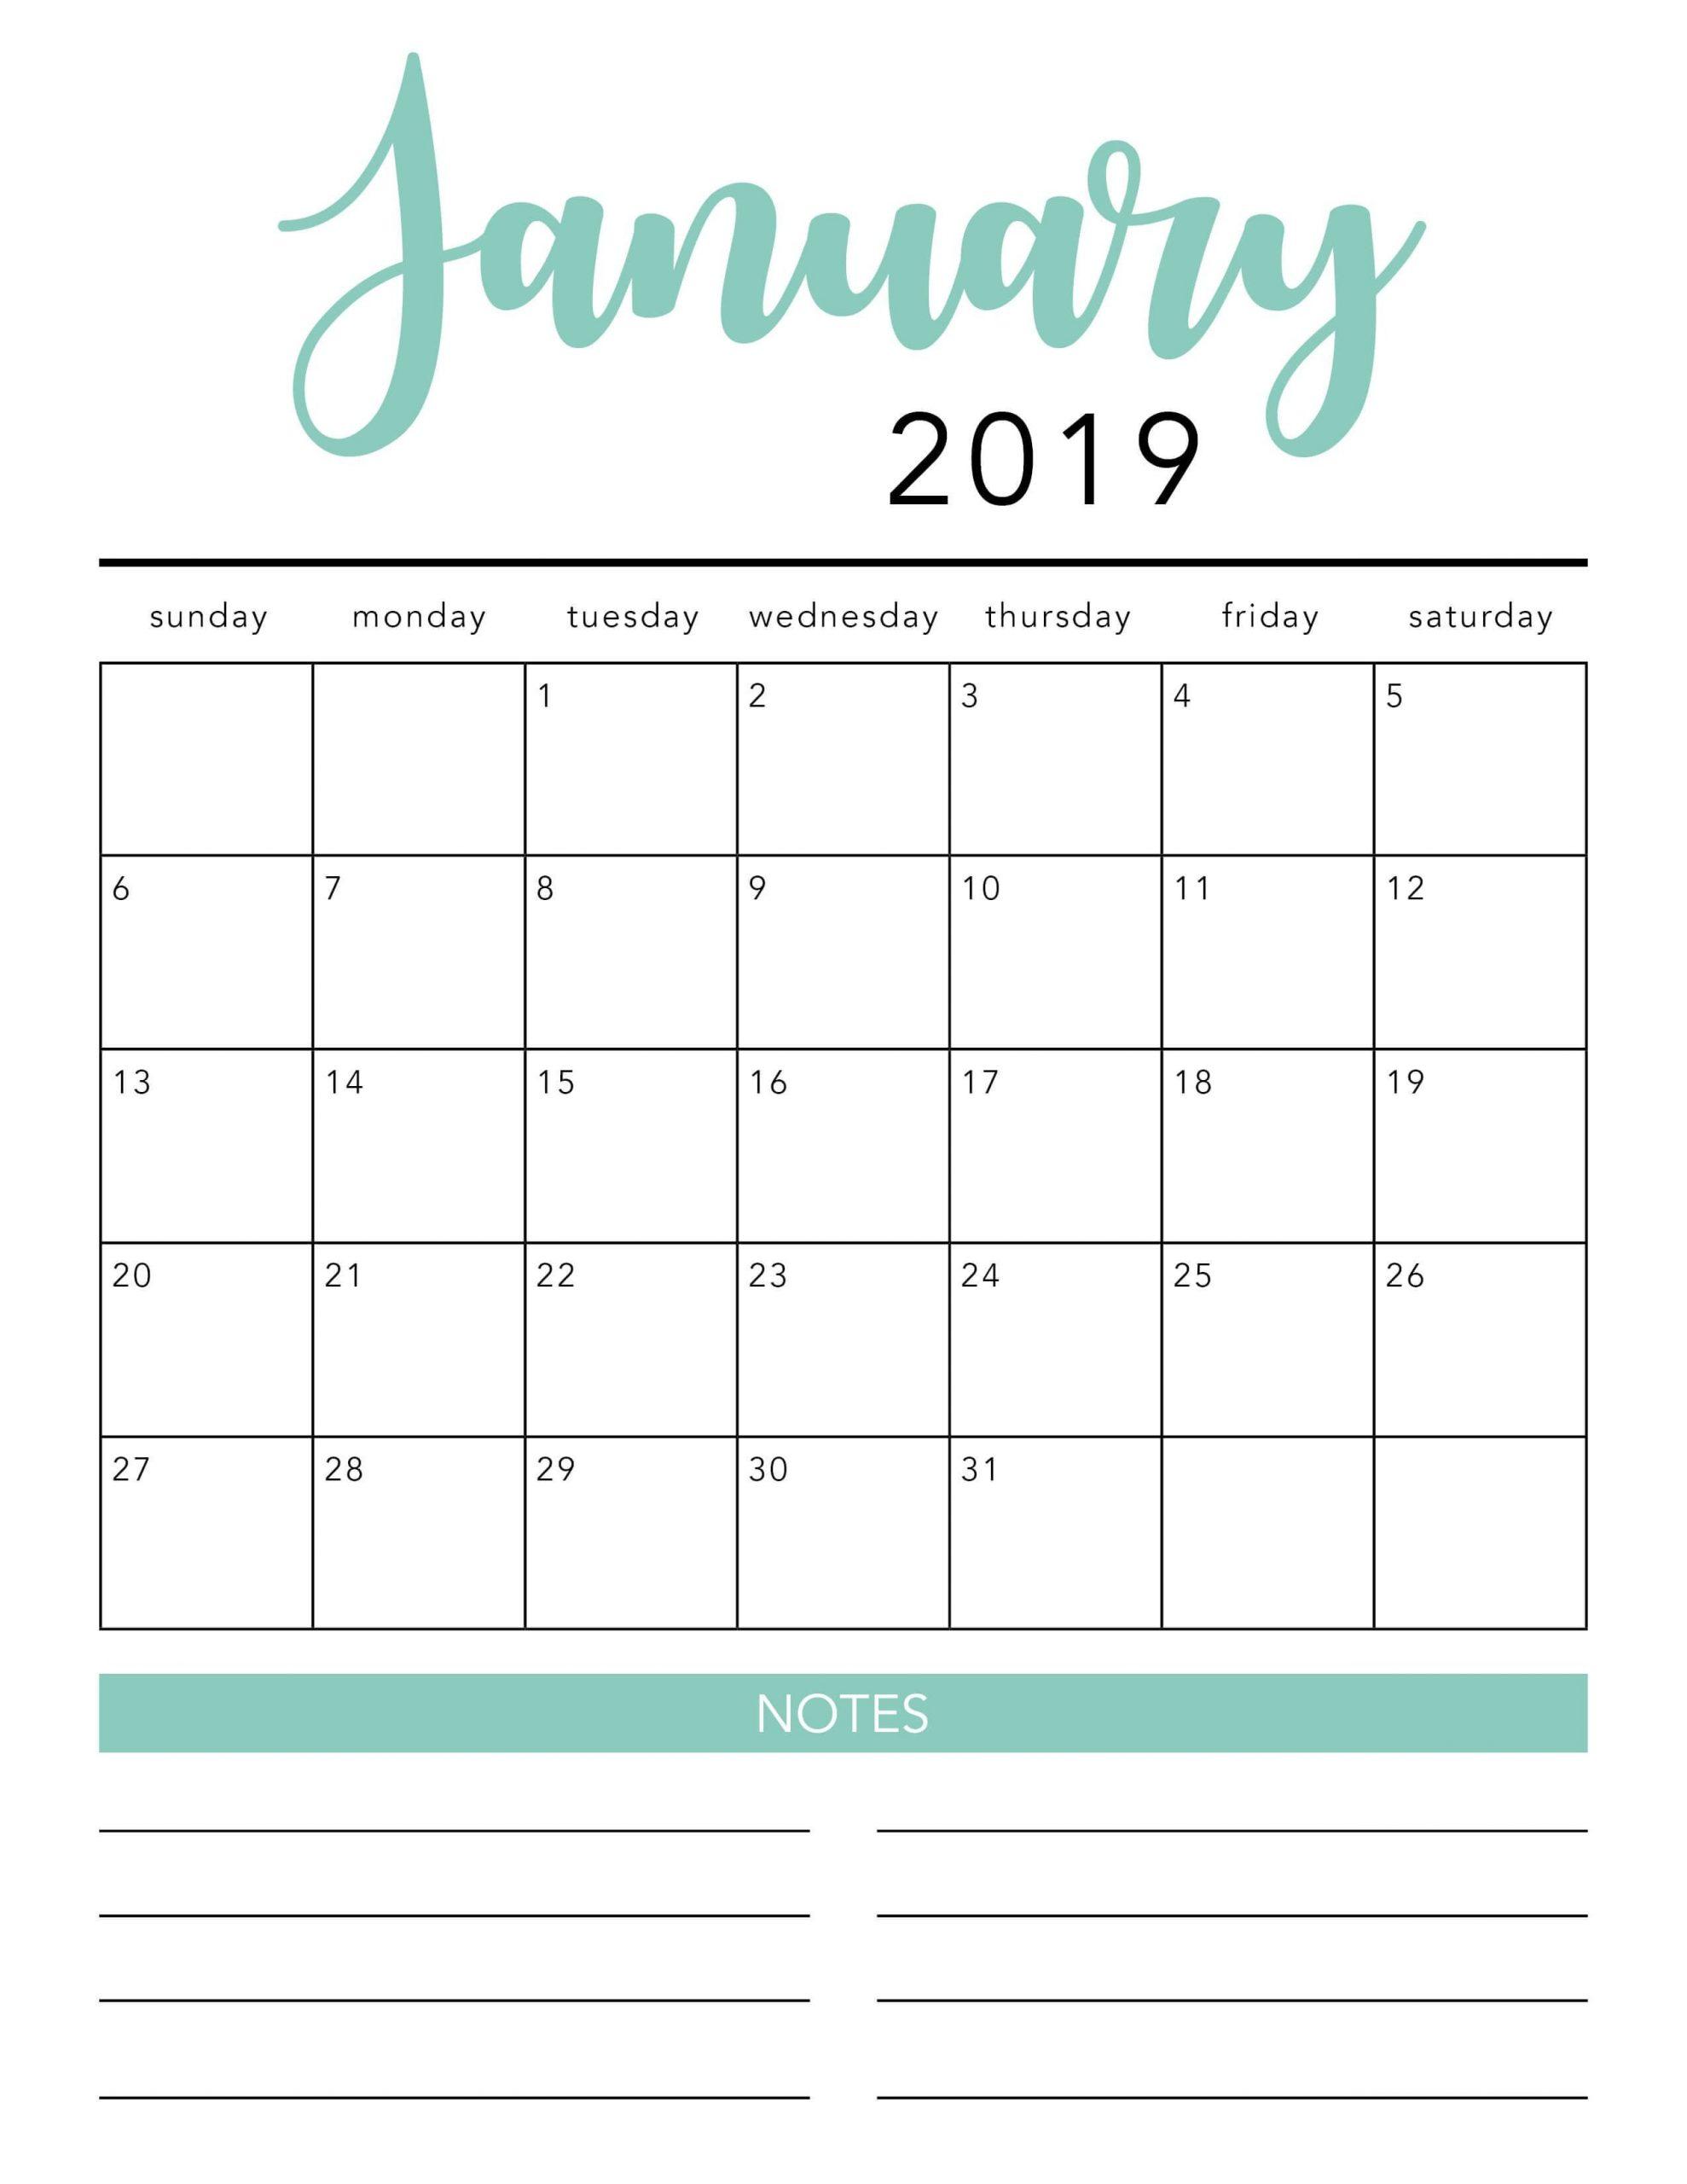 Free 2020 Printable Calendar Template (2 Colors!) - I 3 Month Calendar Template Printable